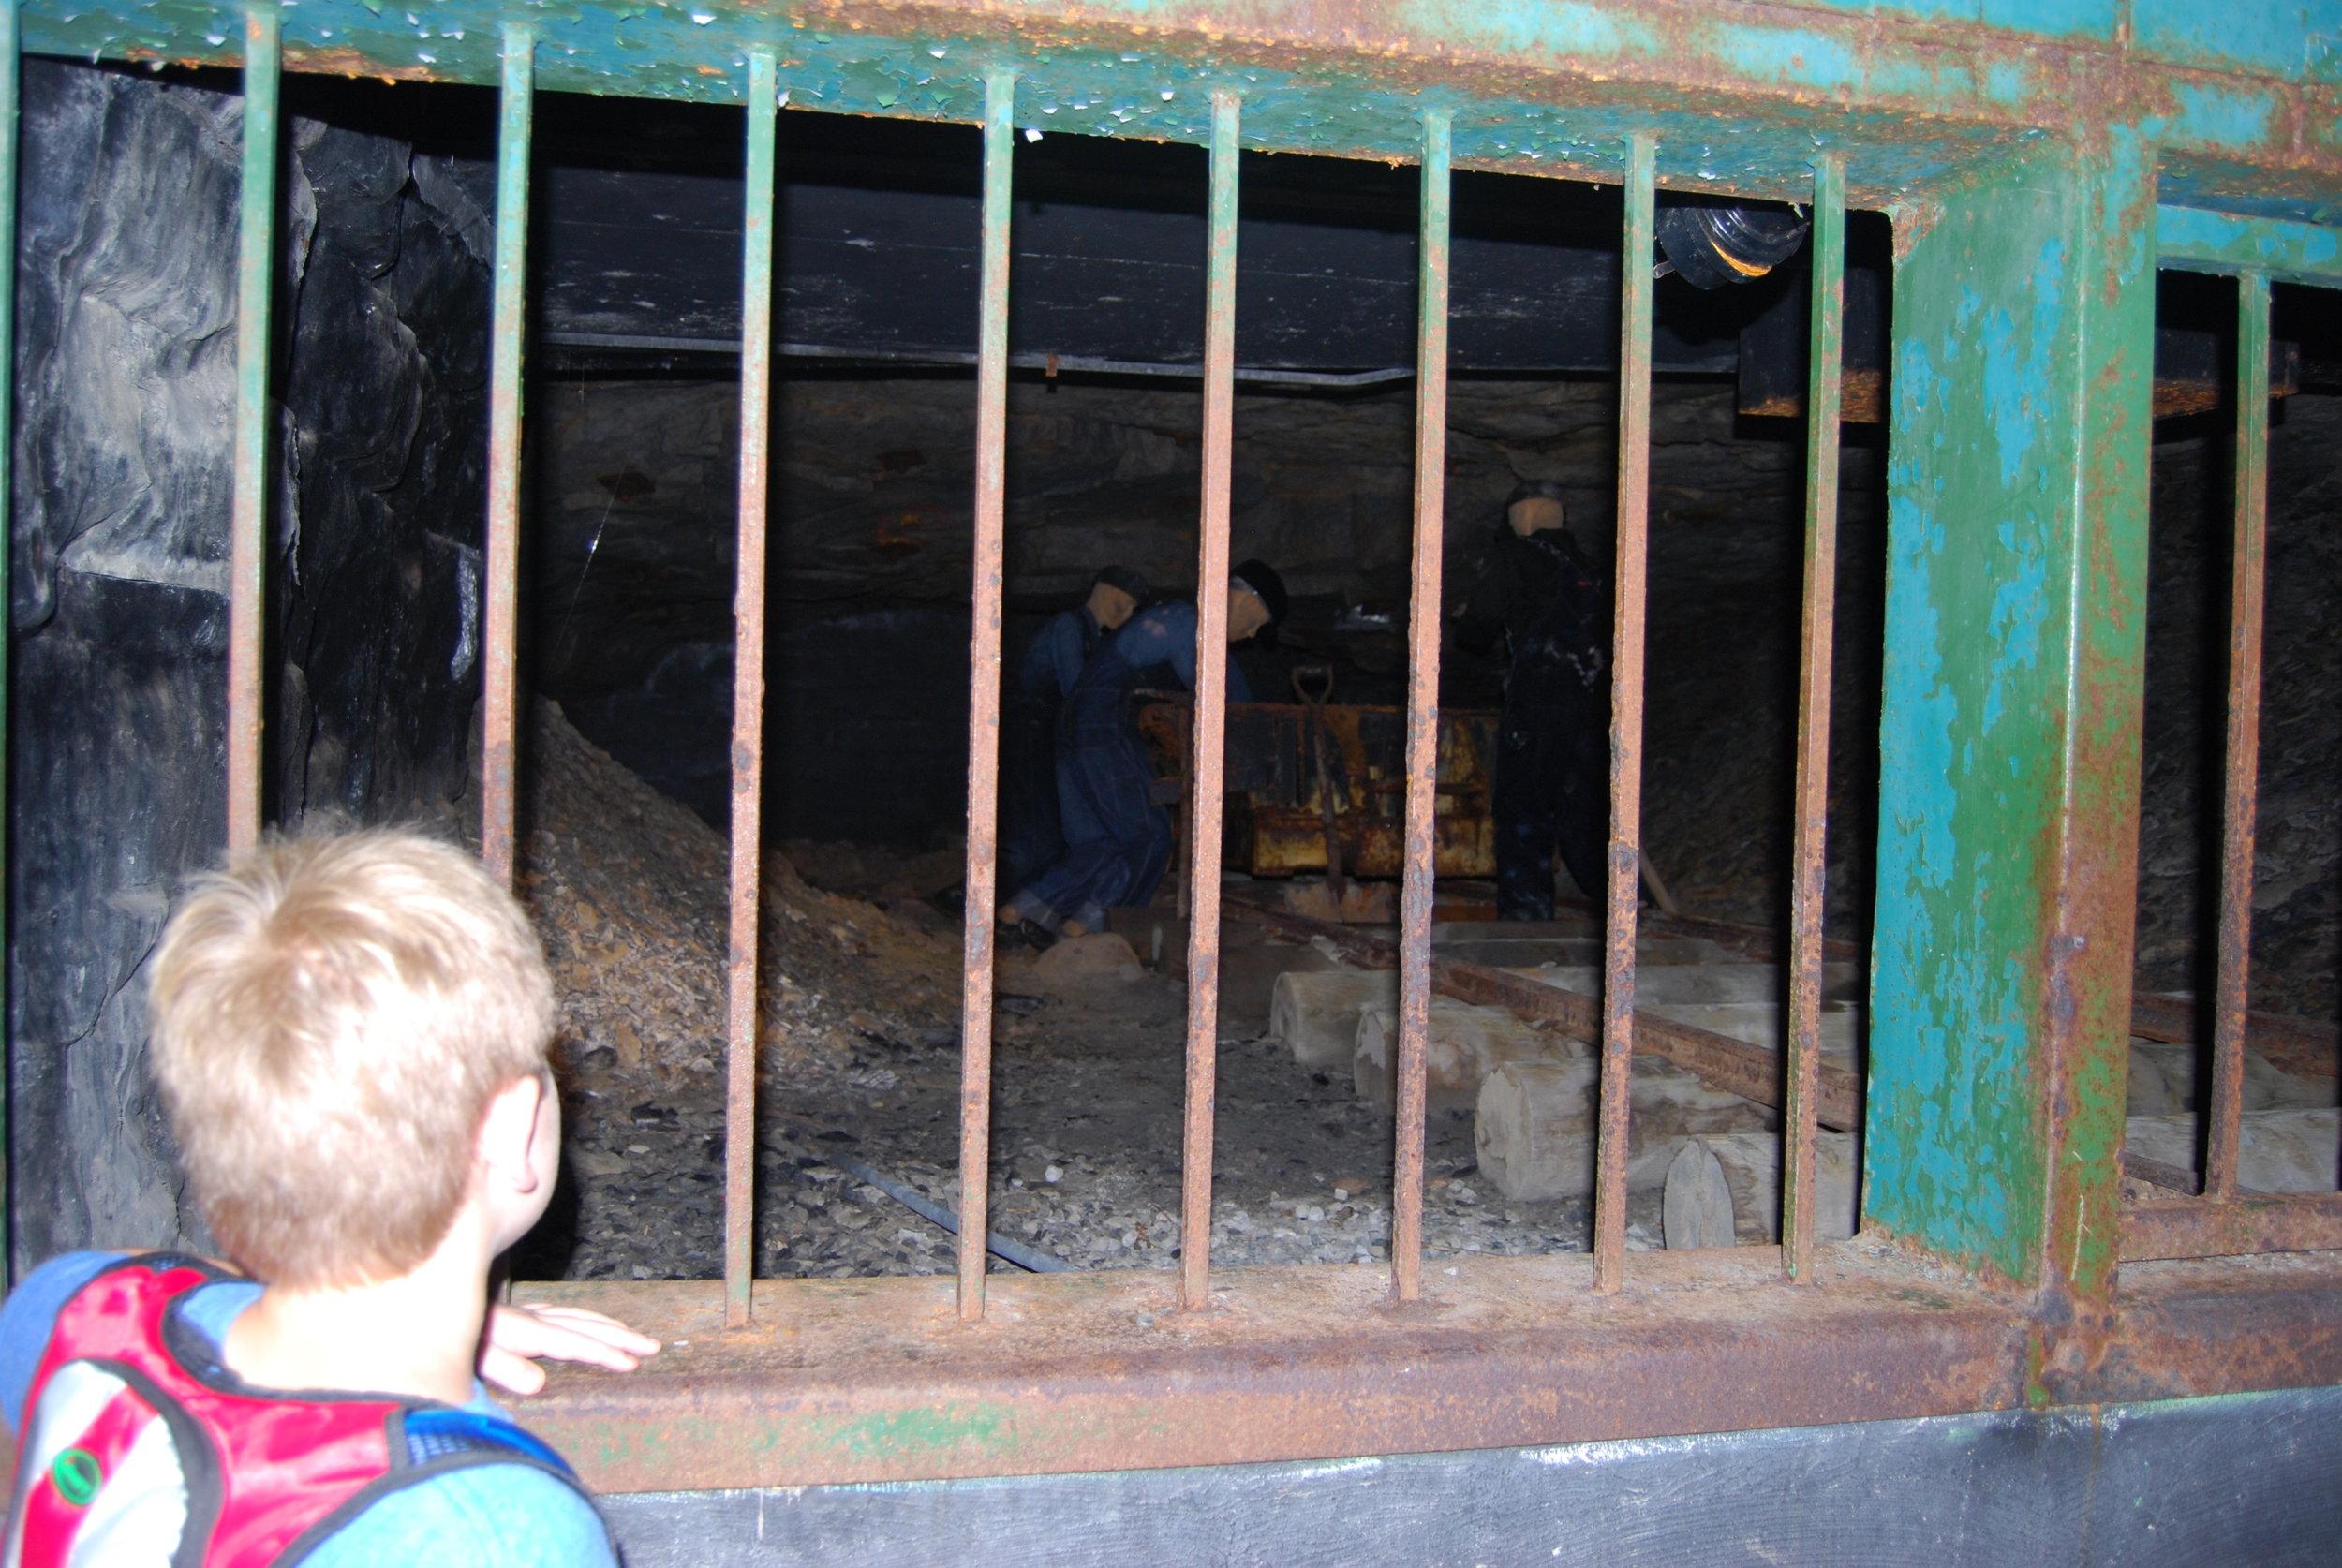 Recreated mining scene inside the mine entrance.